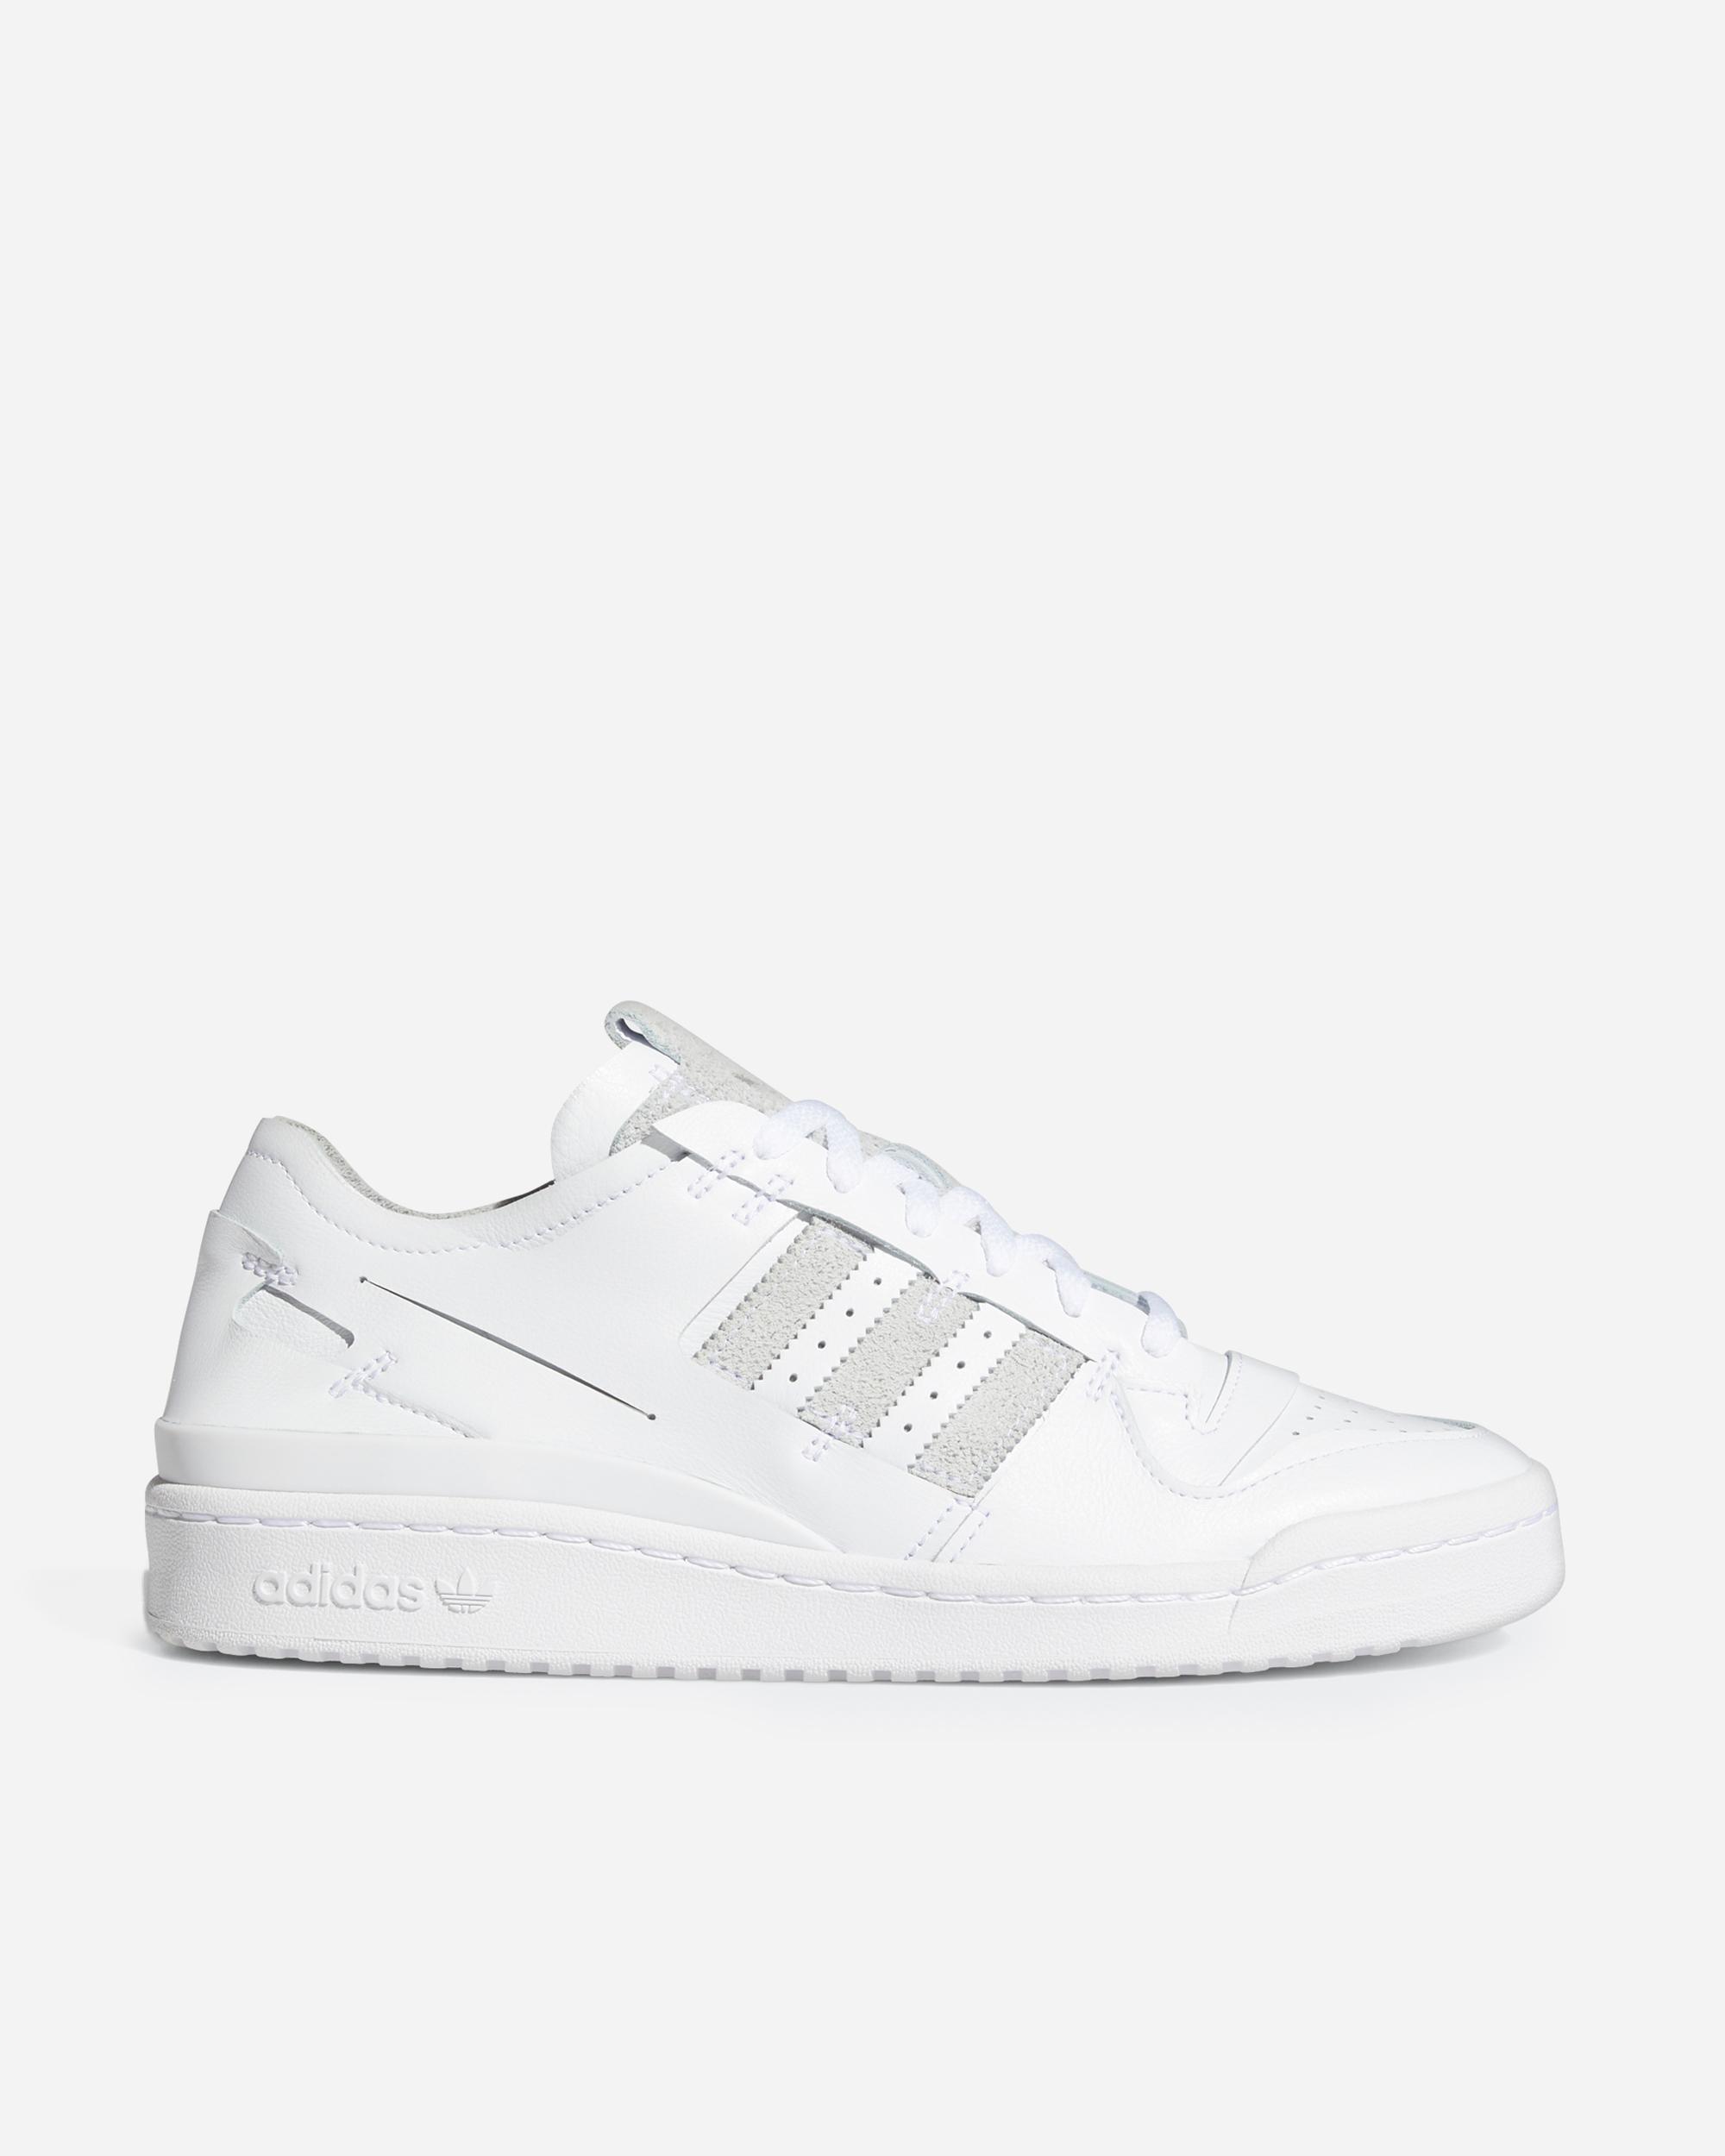 Adidas Originals Forum 84 Low Minimalist Icons Footwear White   FY7997